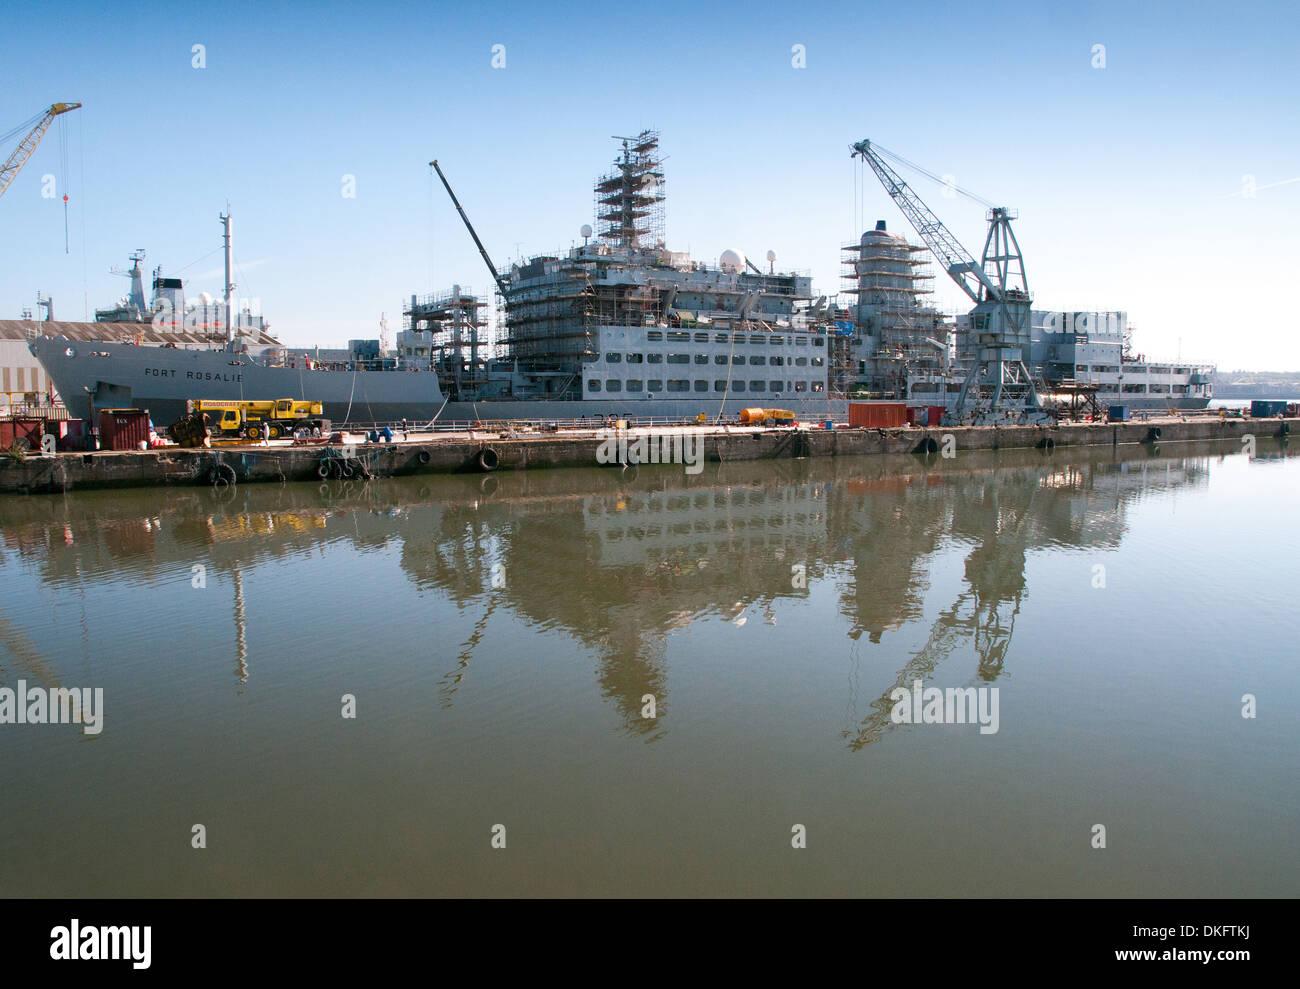 Royal Fleet Auxillery's refitting at Birkenhead - Stock Image